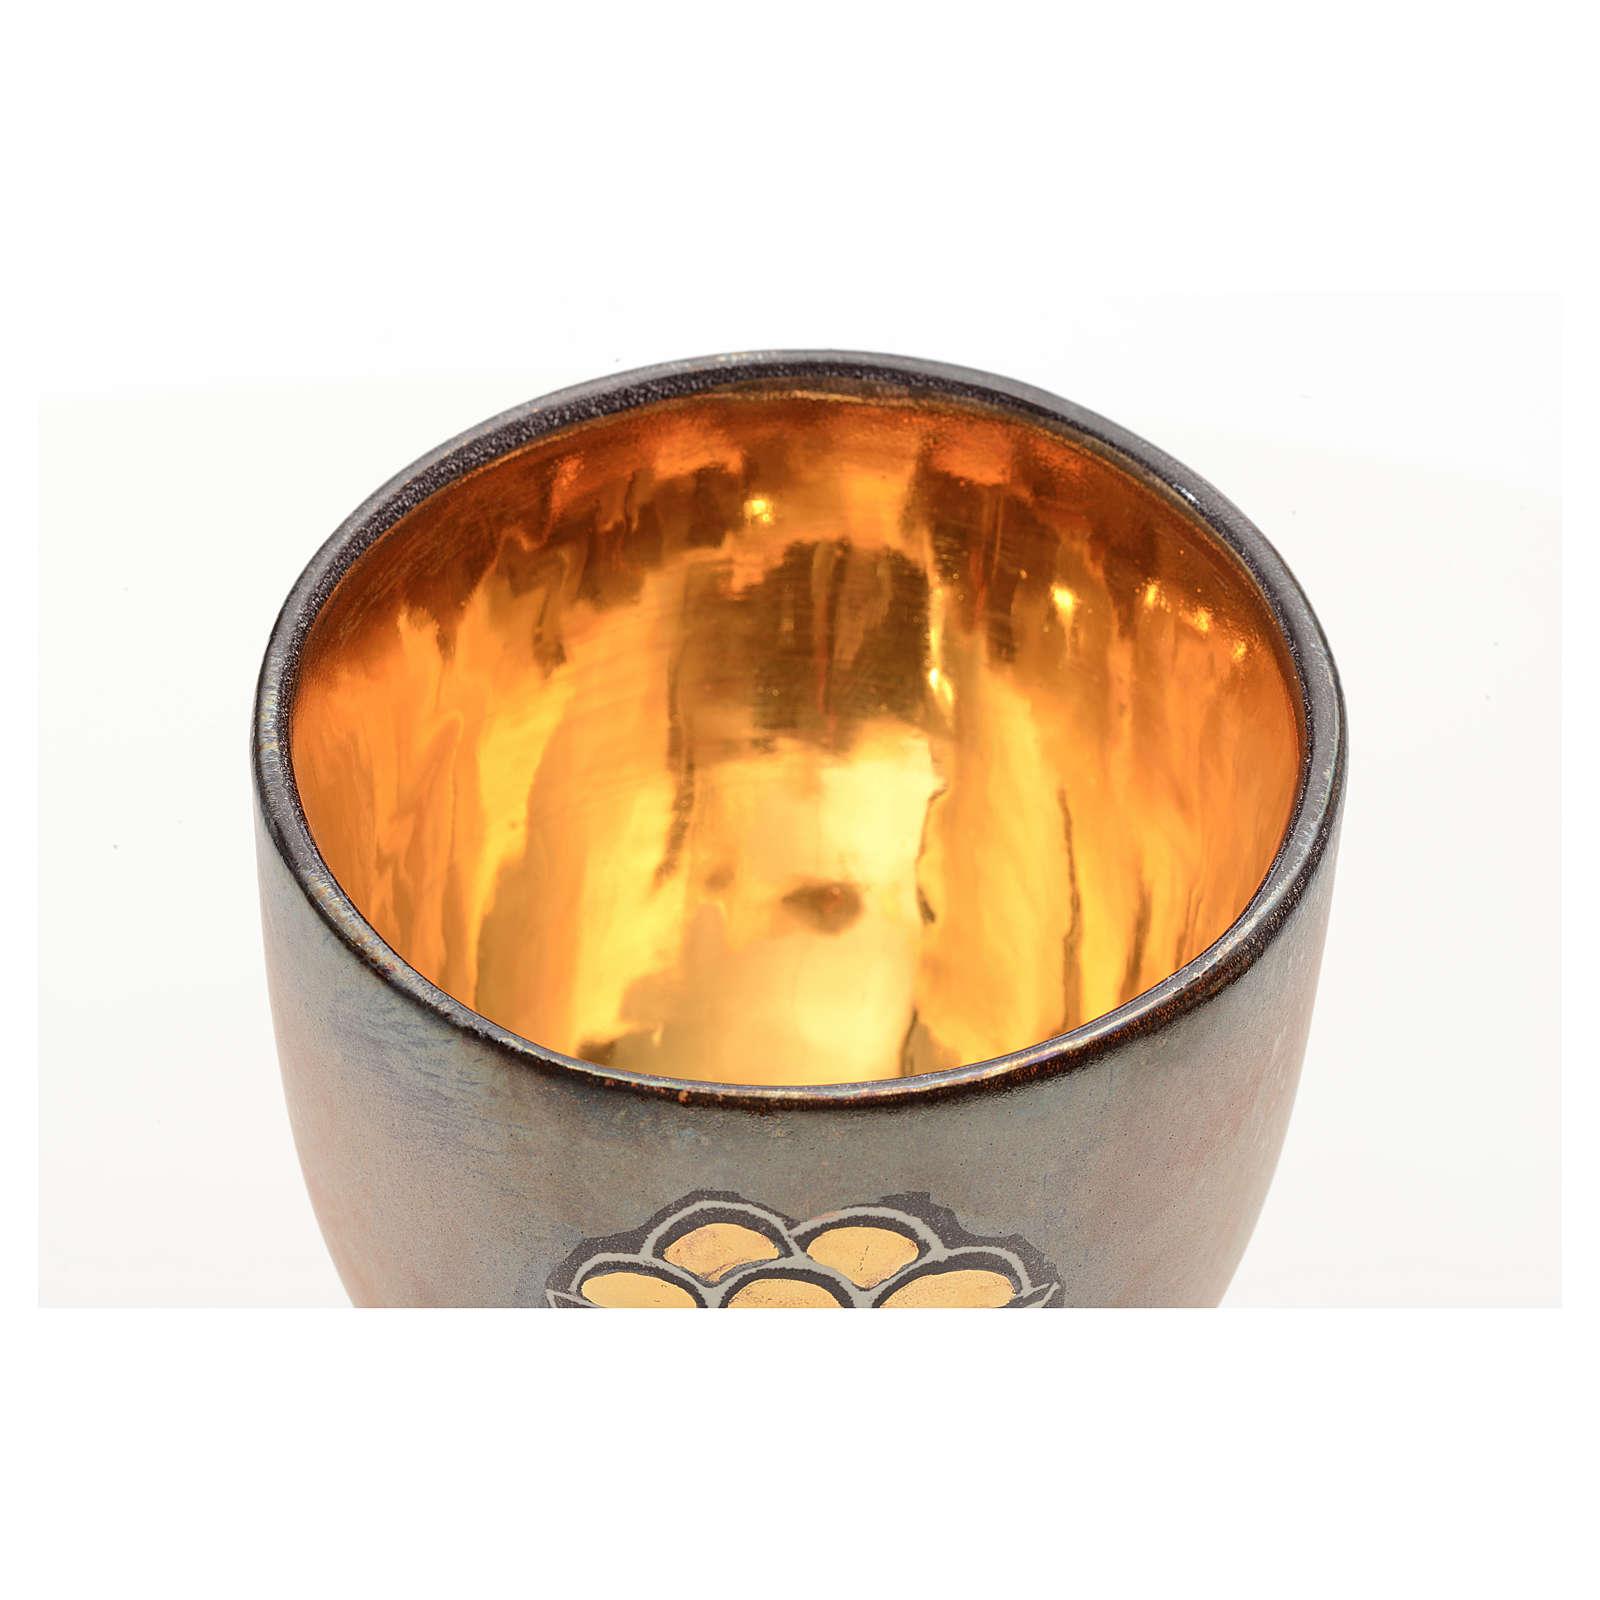 Cáliz cerámica base redonda panes y pez dorado int 4